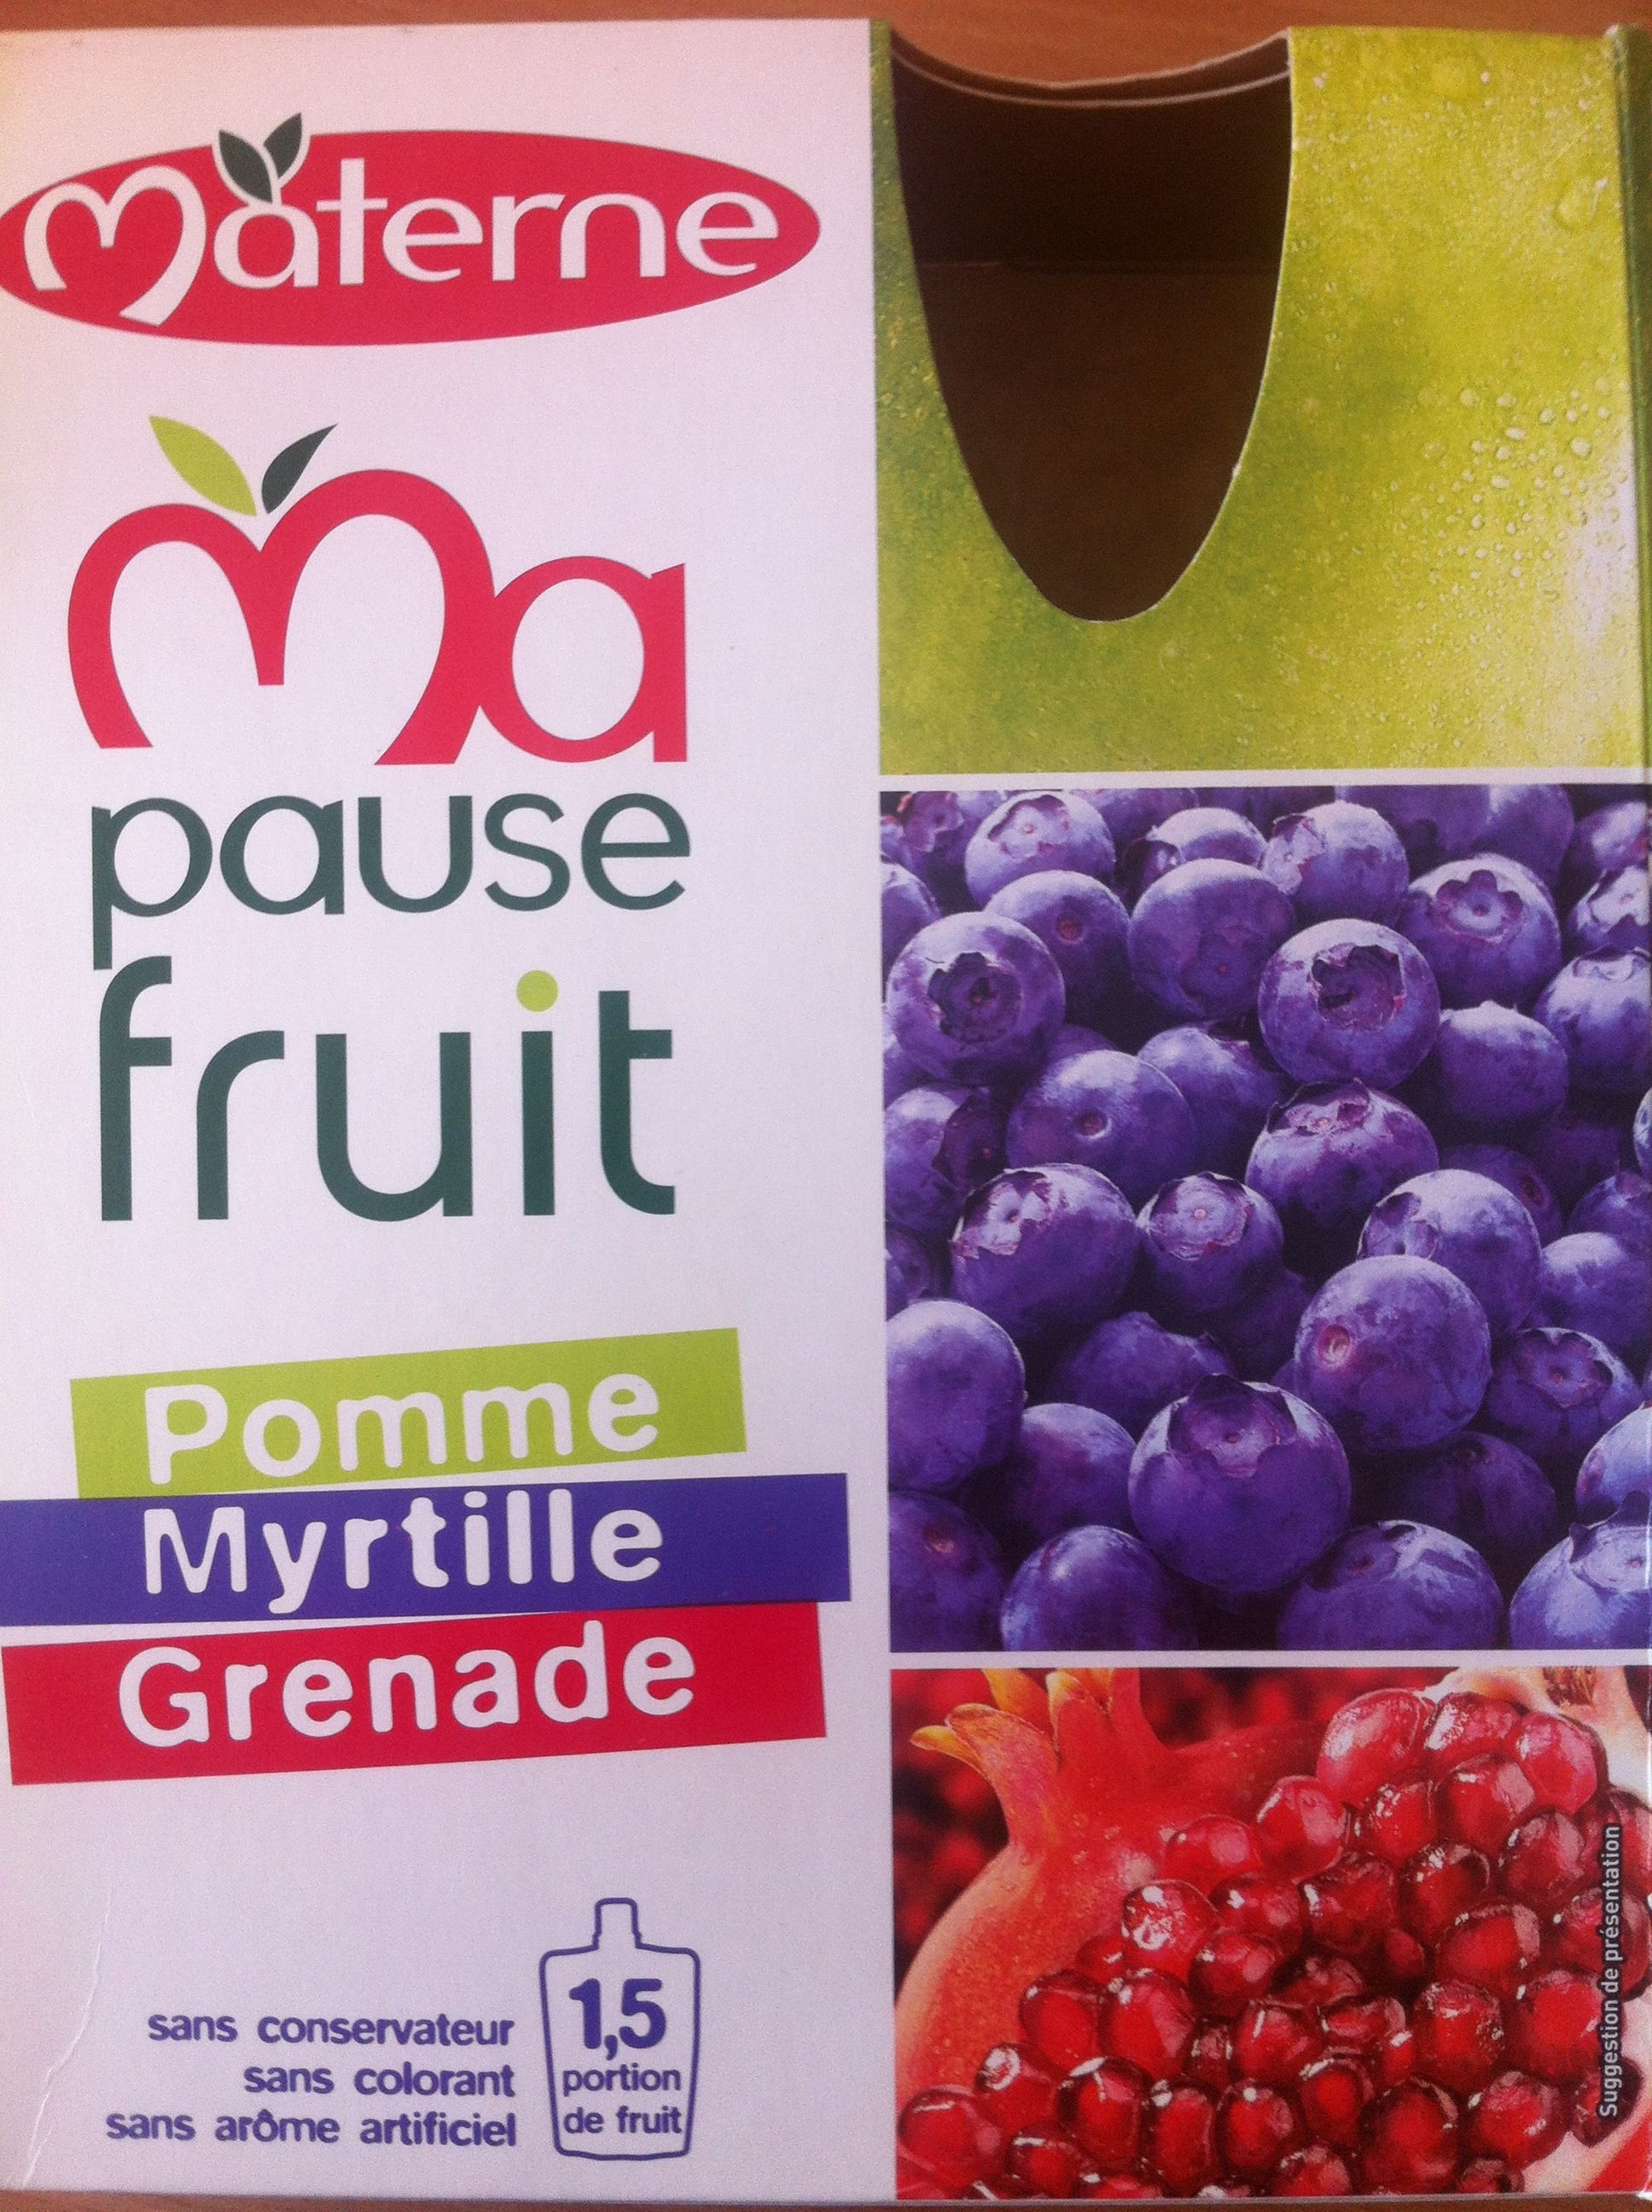 Ma pause fruit pomme myrtille grenade - Produit - fr